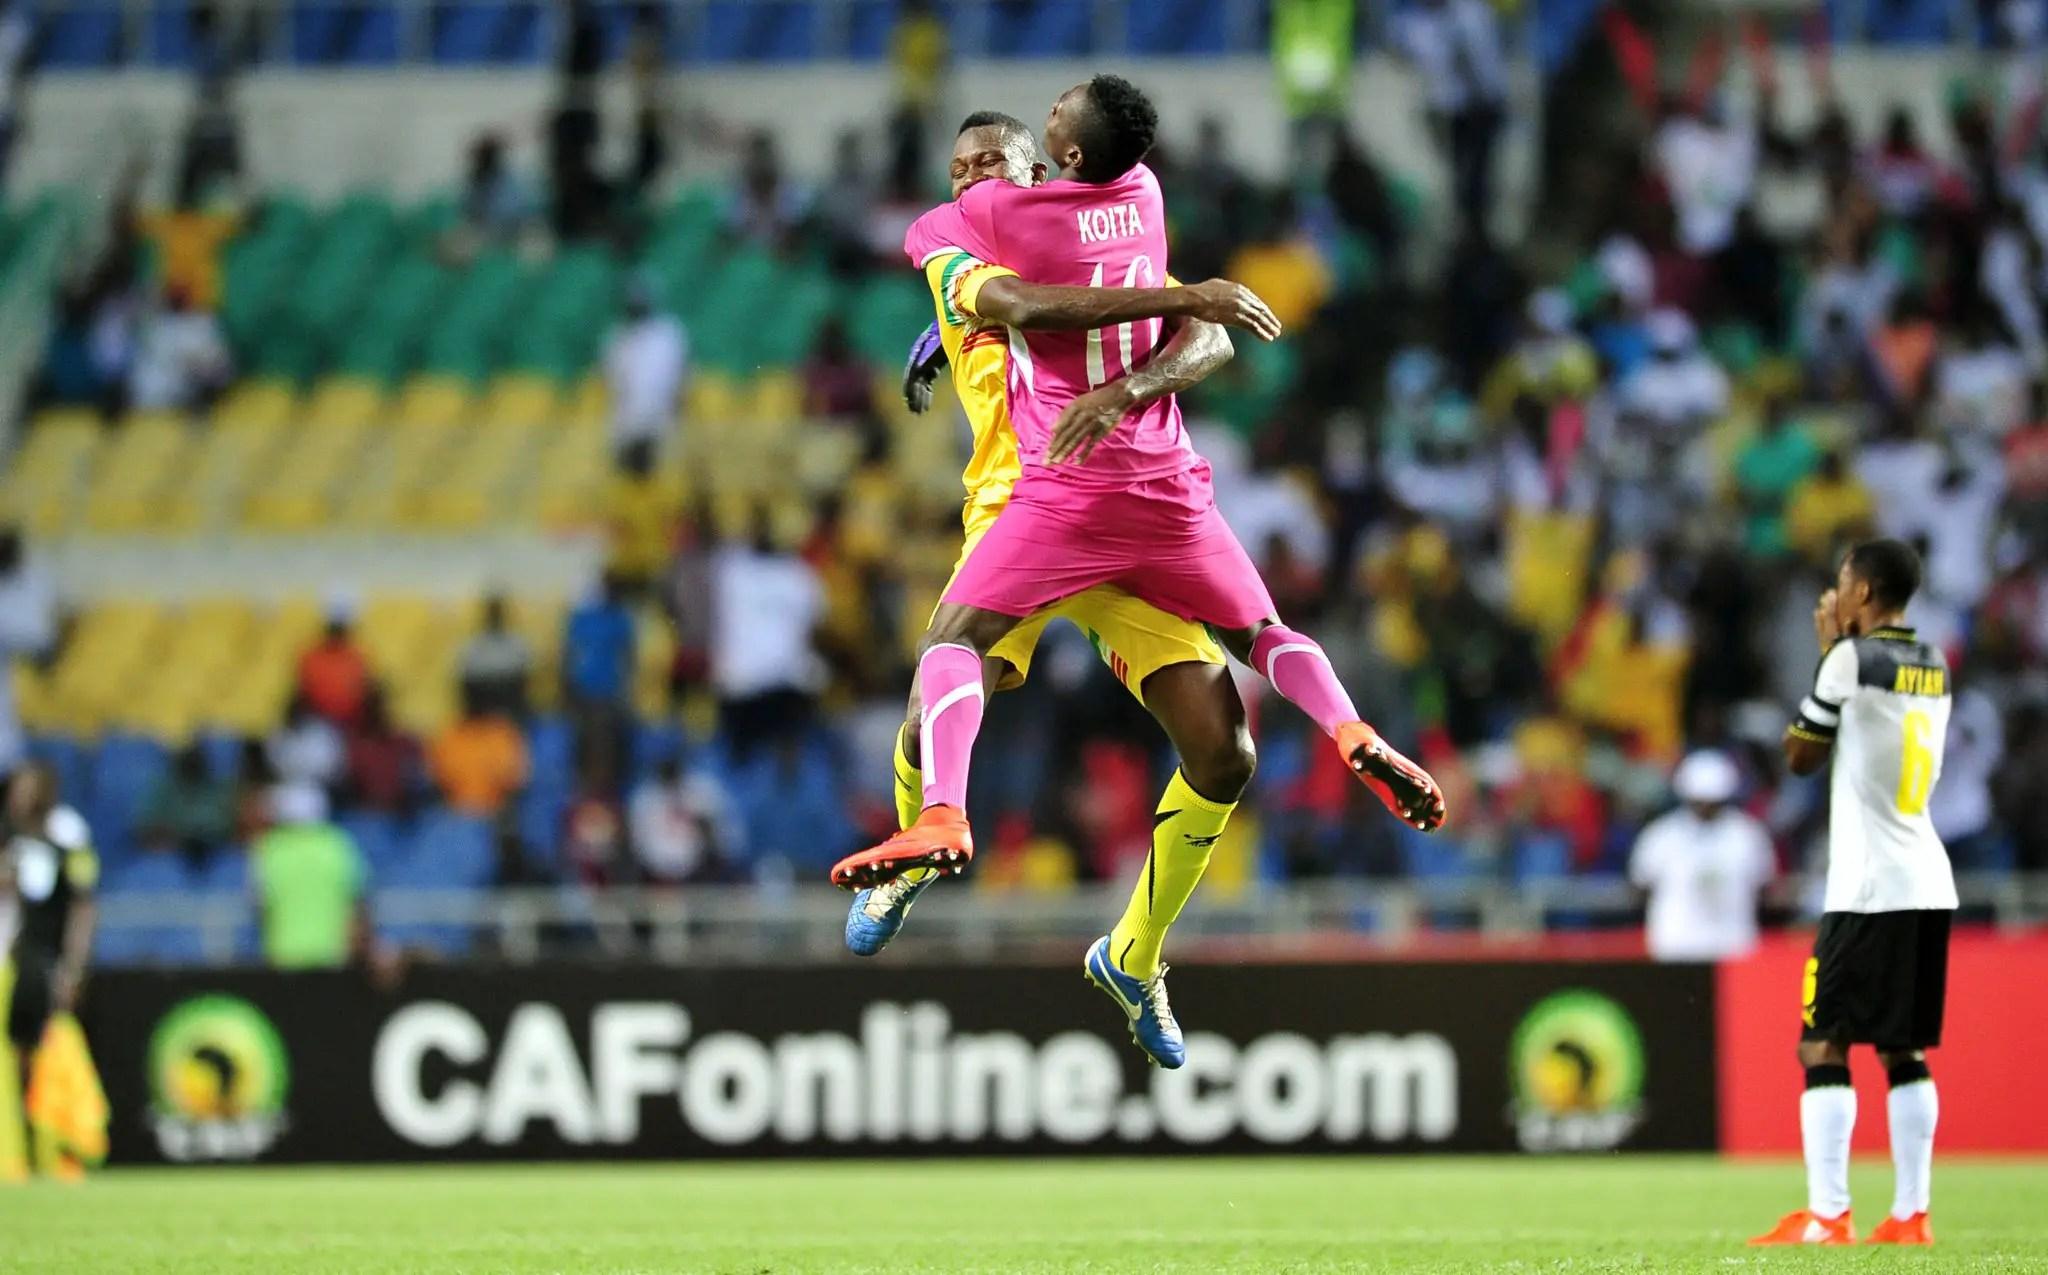 Mali Edge Ghana To Retain AFCON U-17 Title